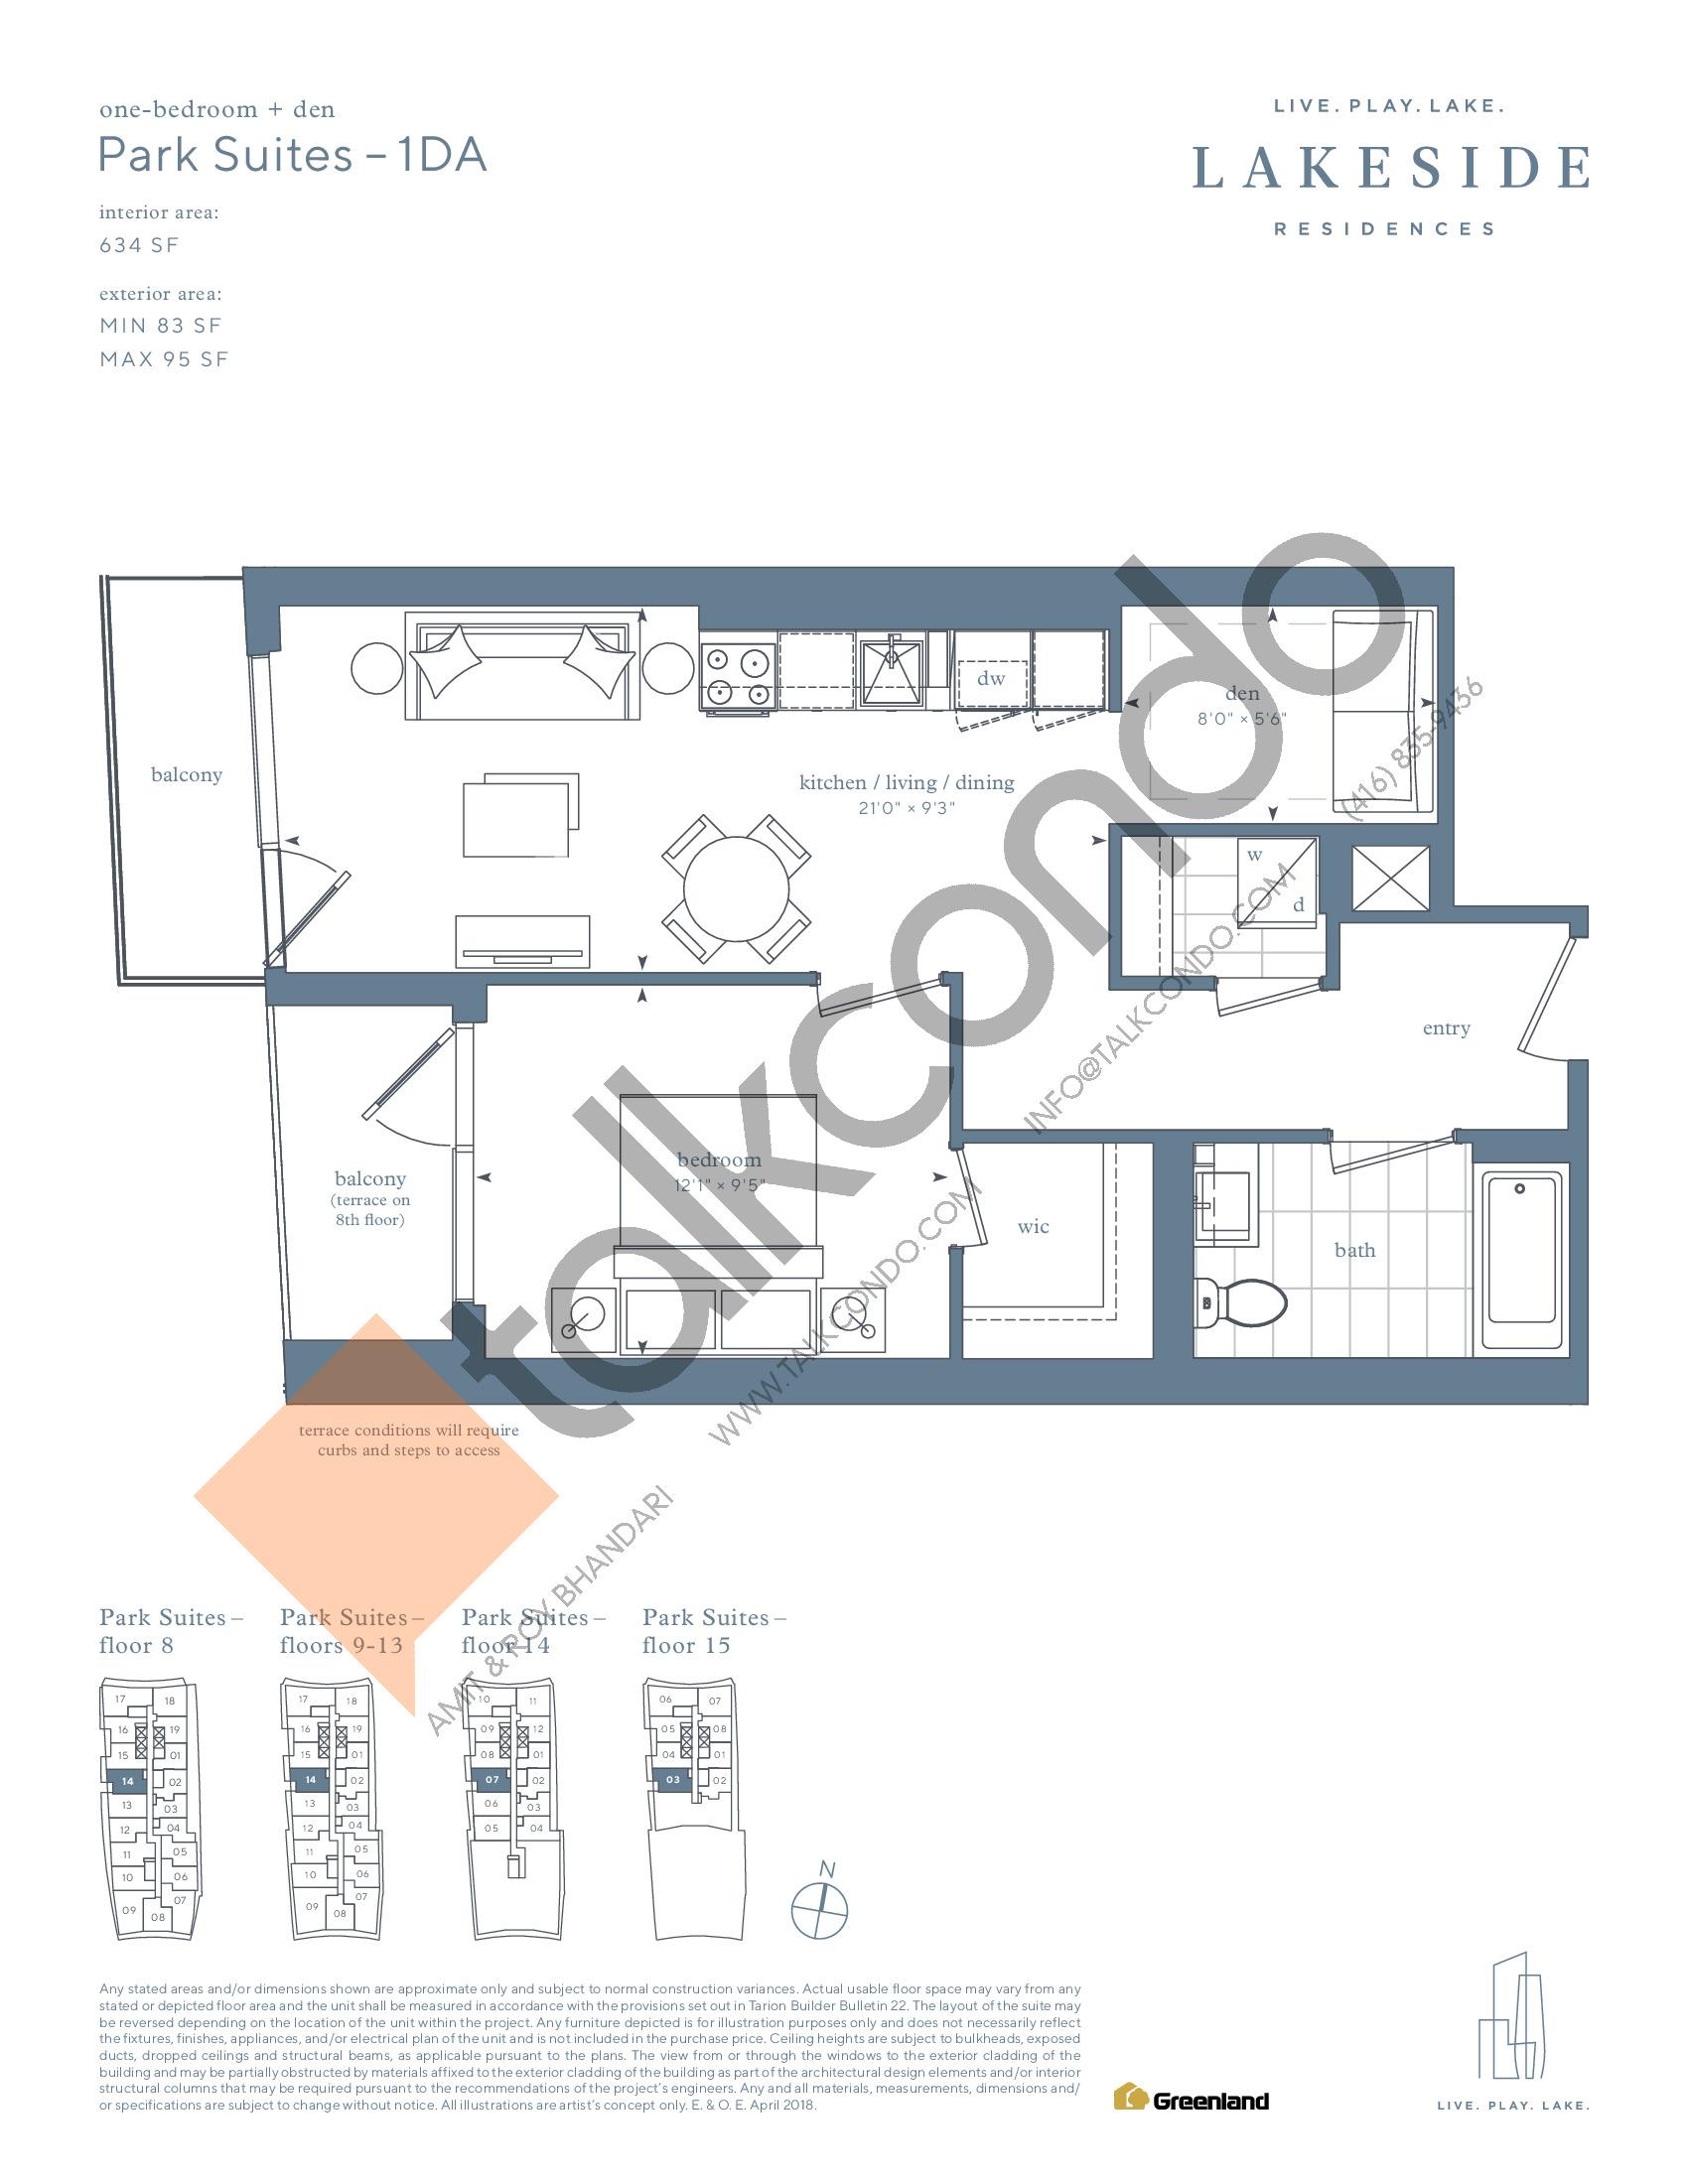 Park Suites - 1DA Floor Plan at Lakeside Residences - 634 sq.ft